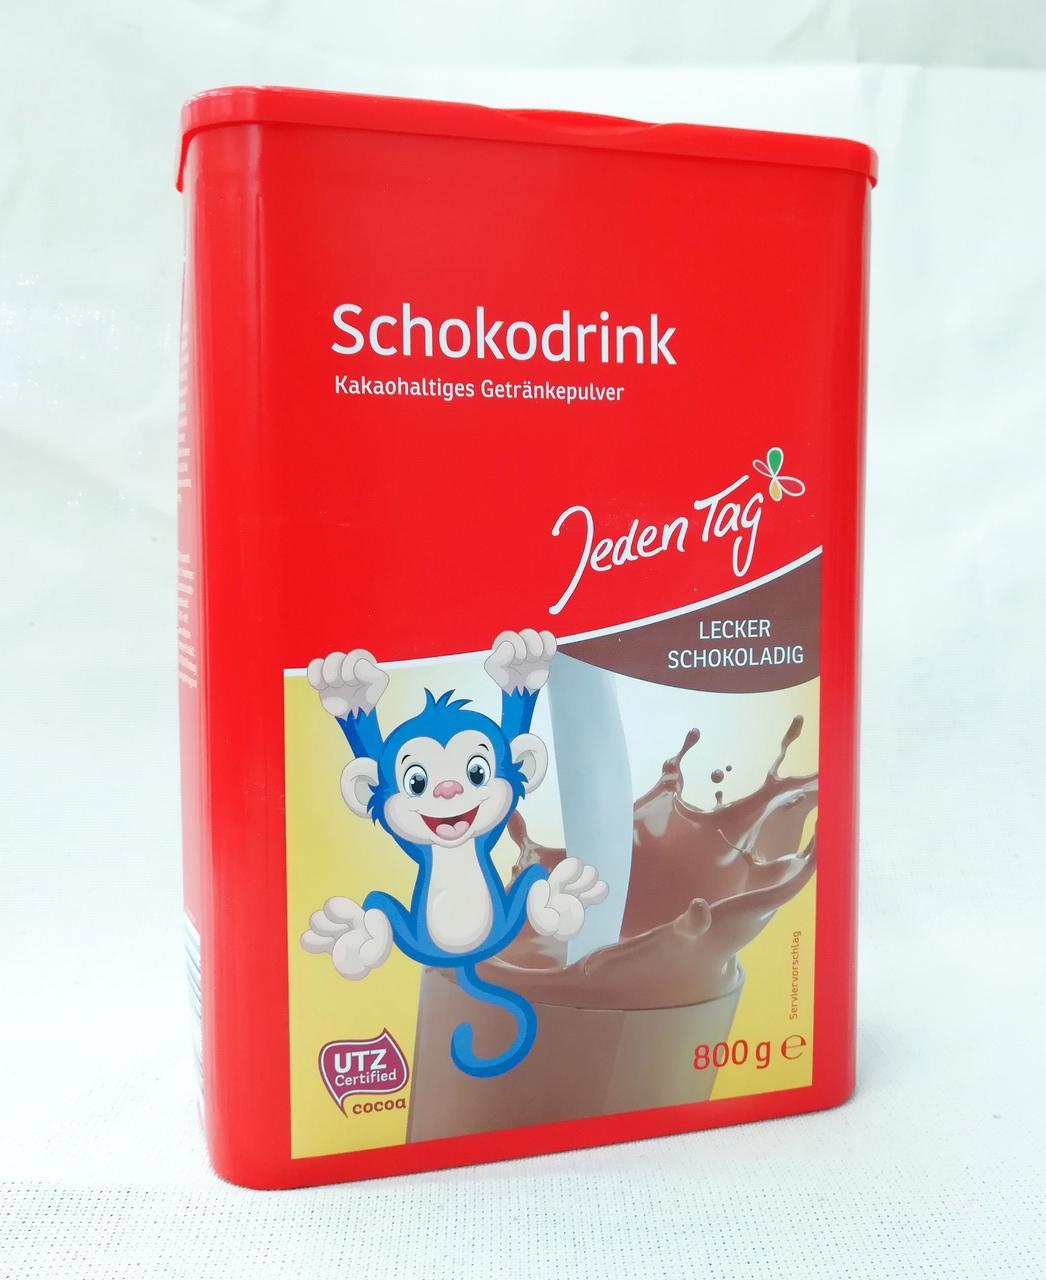 Какао напиток Schokodrink 800 gram